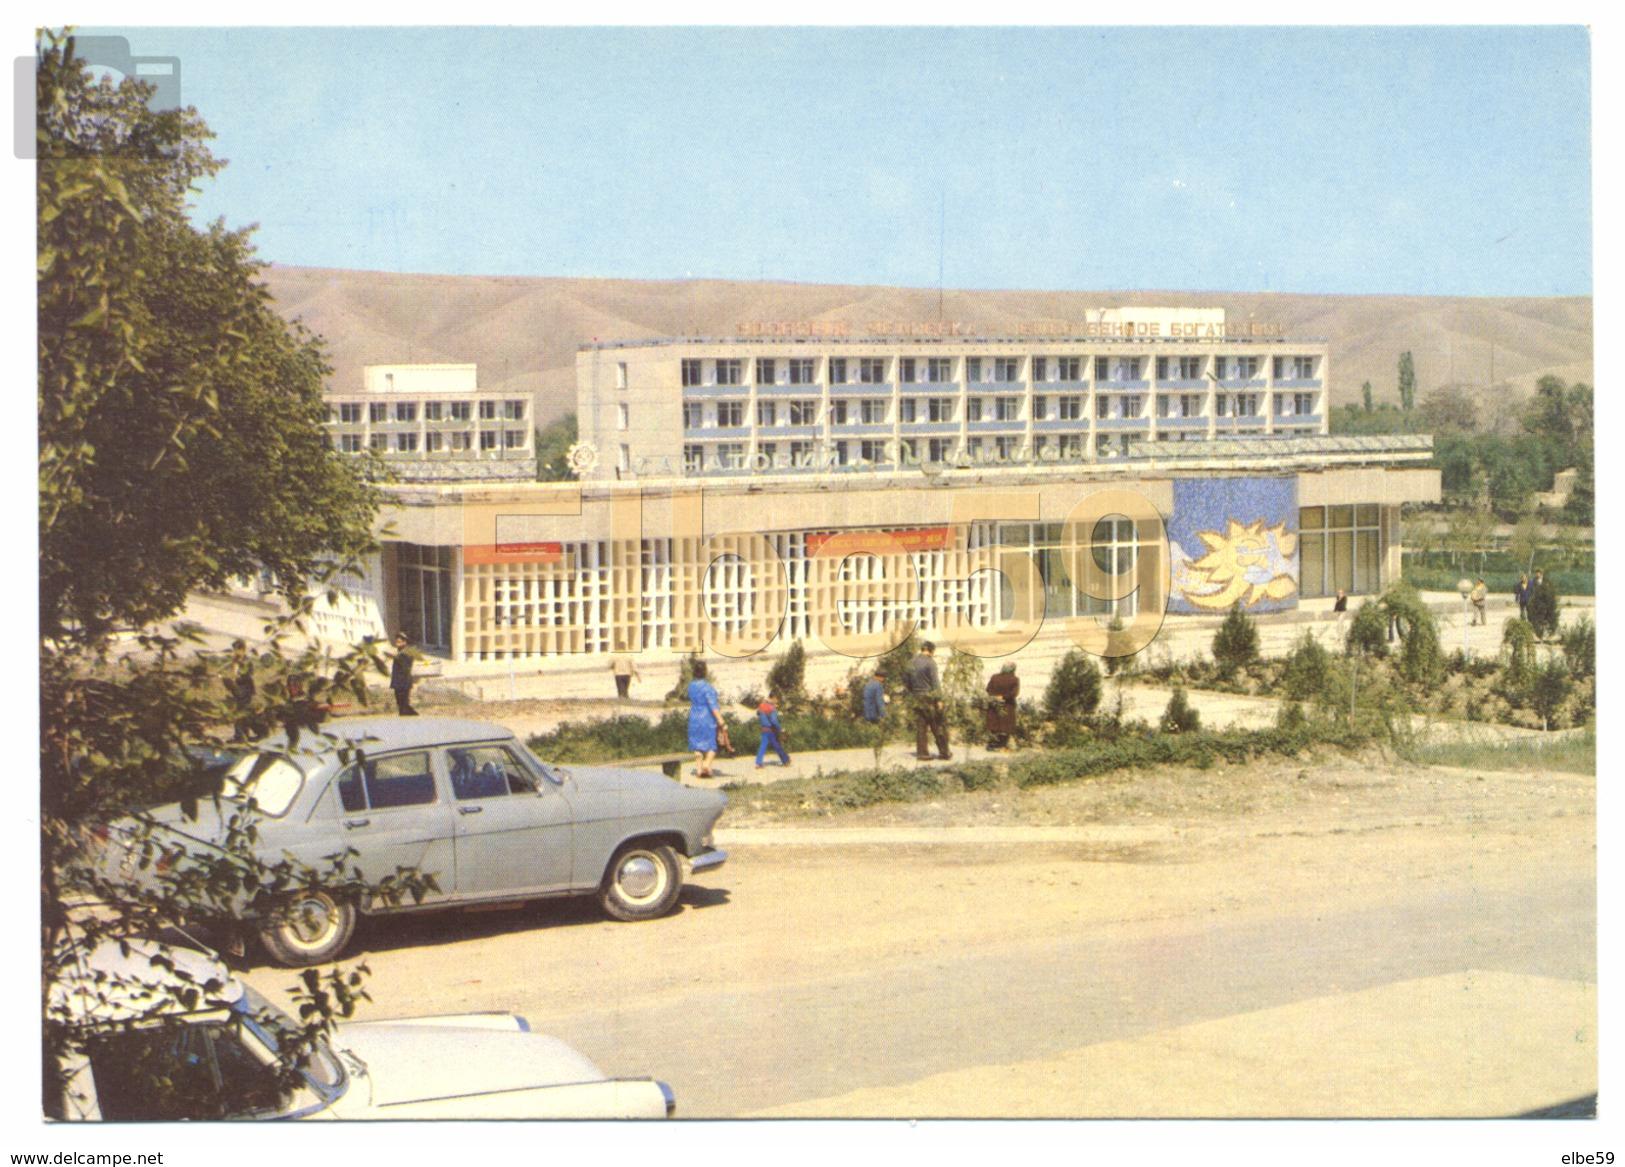 Ouzbékistan, Fergana, Sanatorium Chimion, Sur Entier Postal 4 K., 1982, Neuve - Uzbekistan